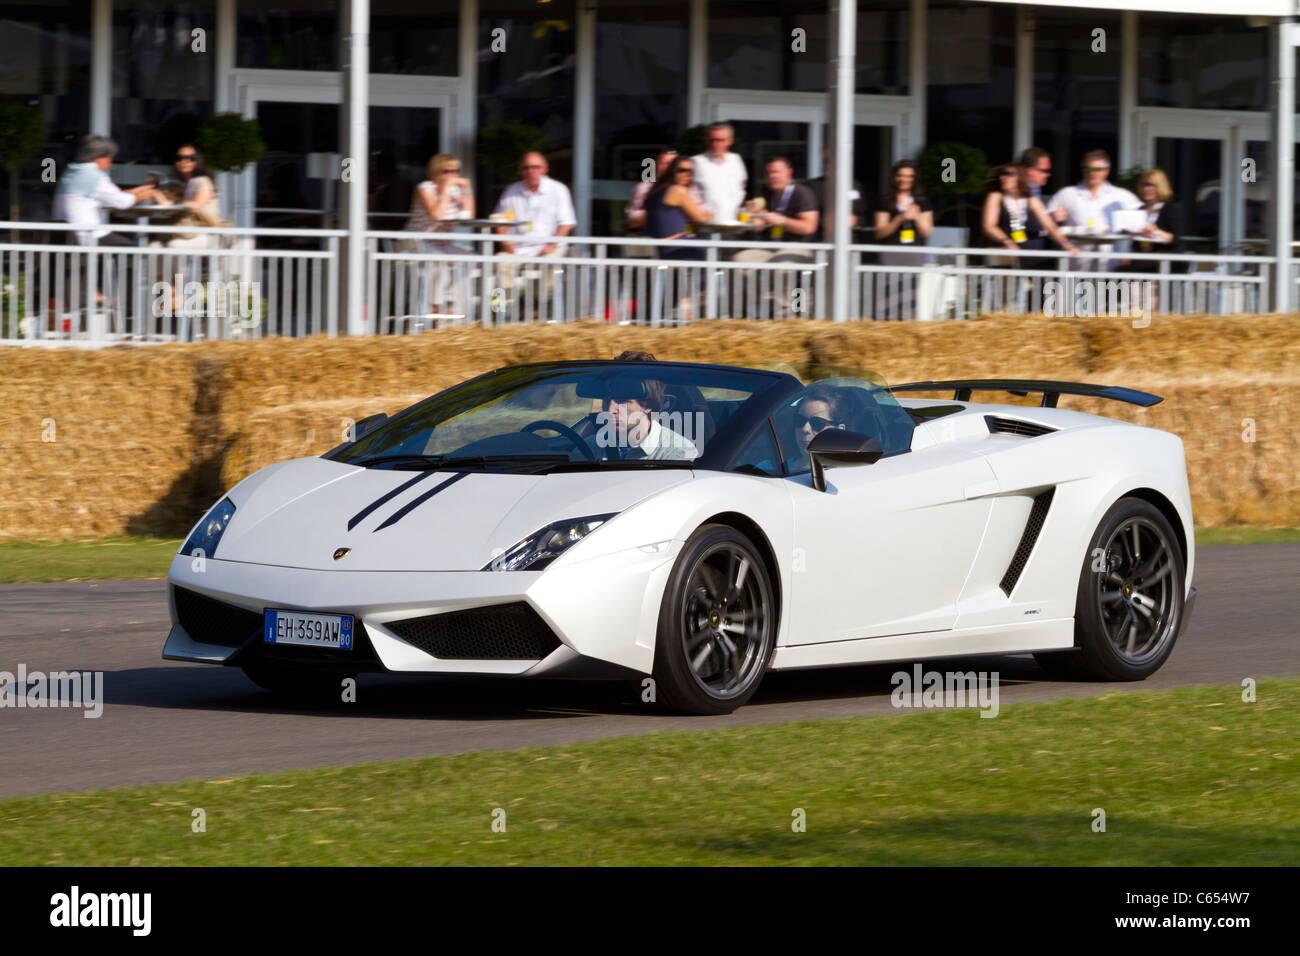 2011 Lamborghini Gallardo Spyder Performante At The Goodwood